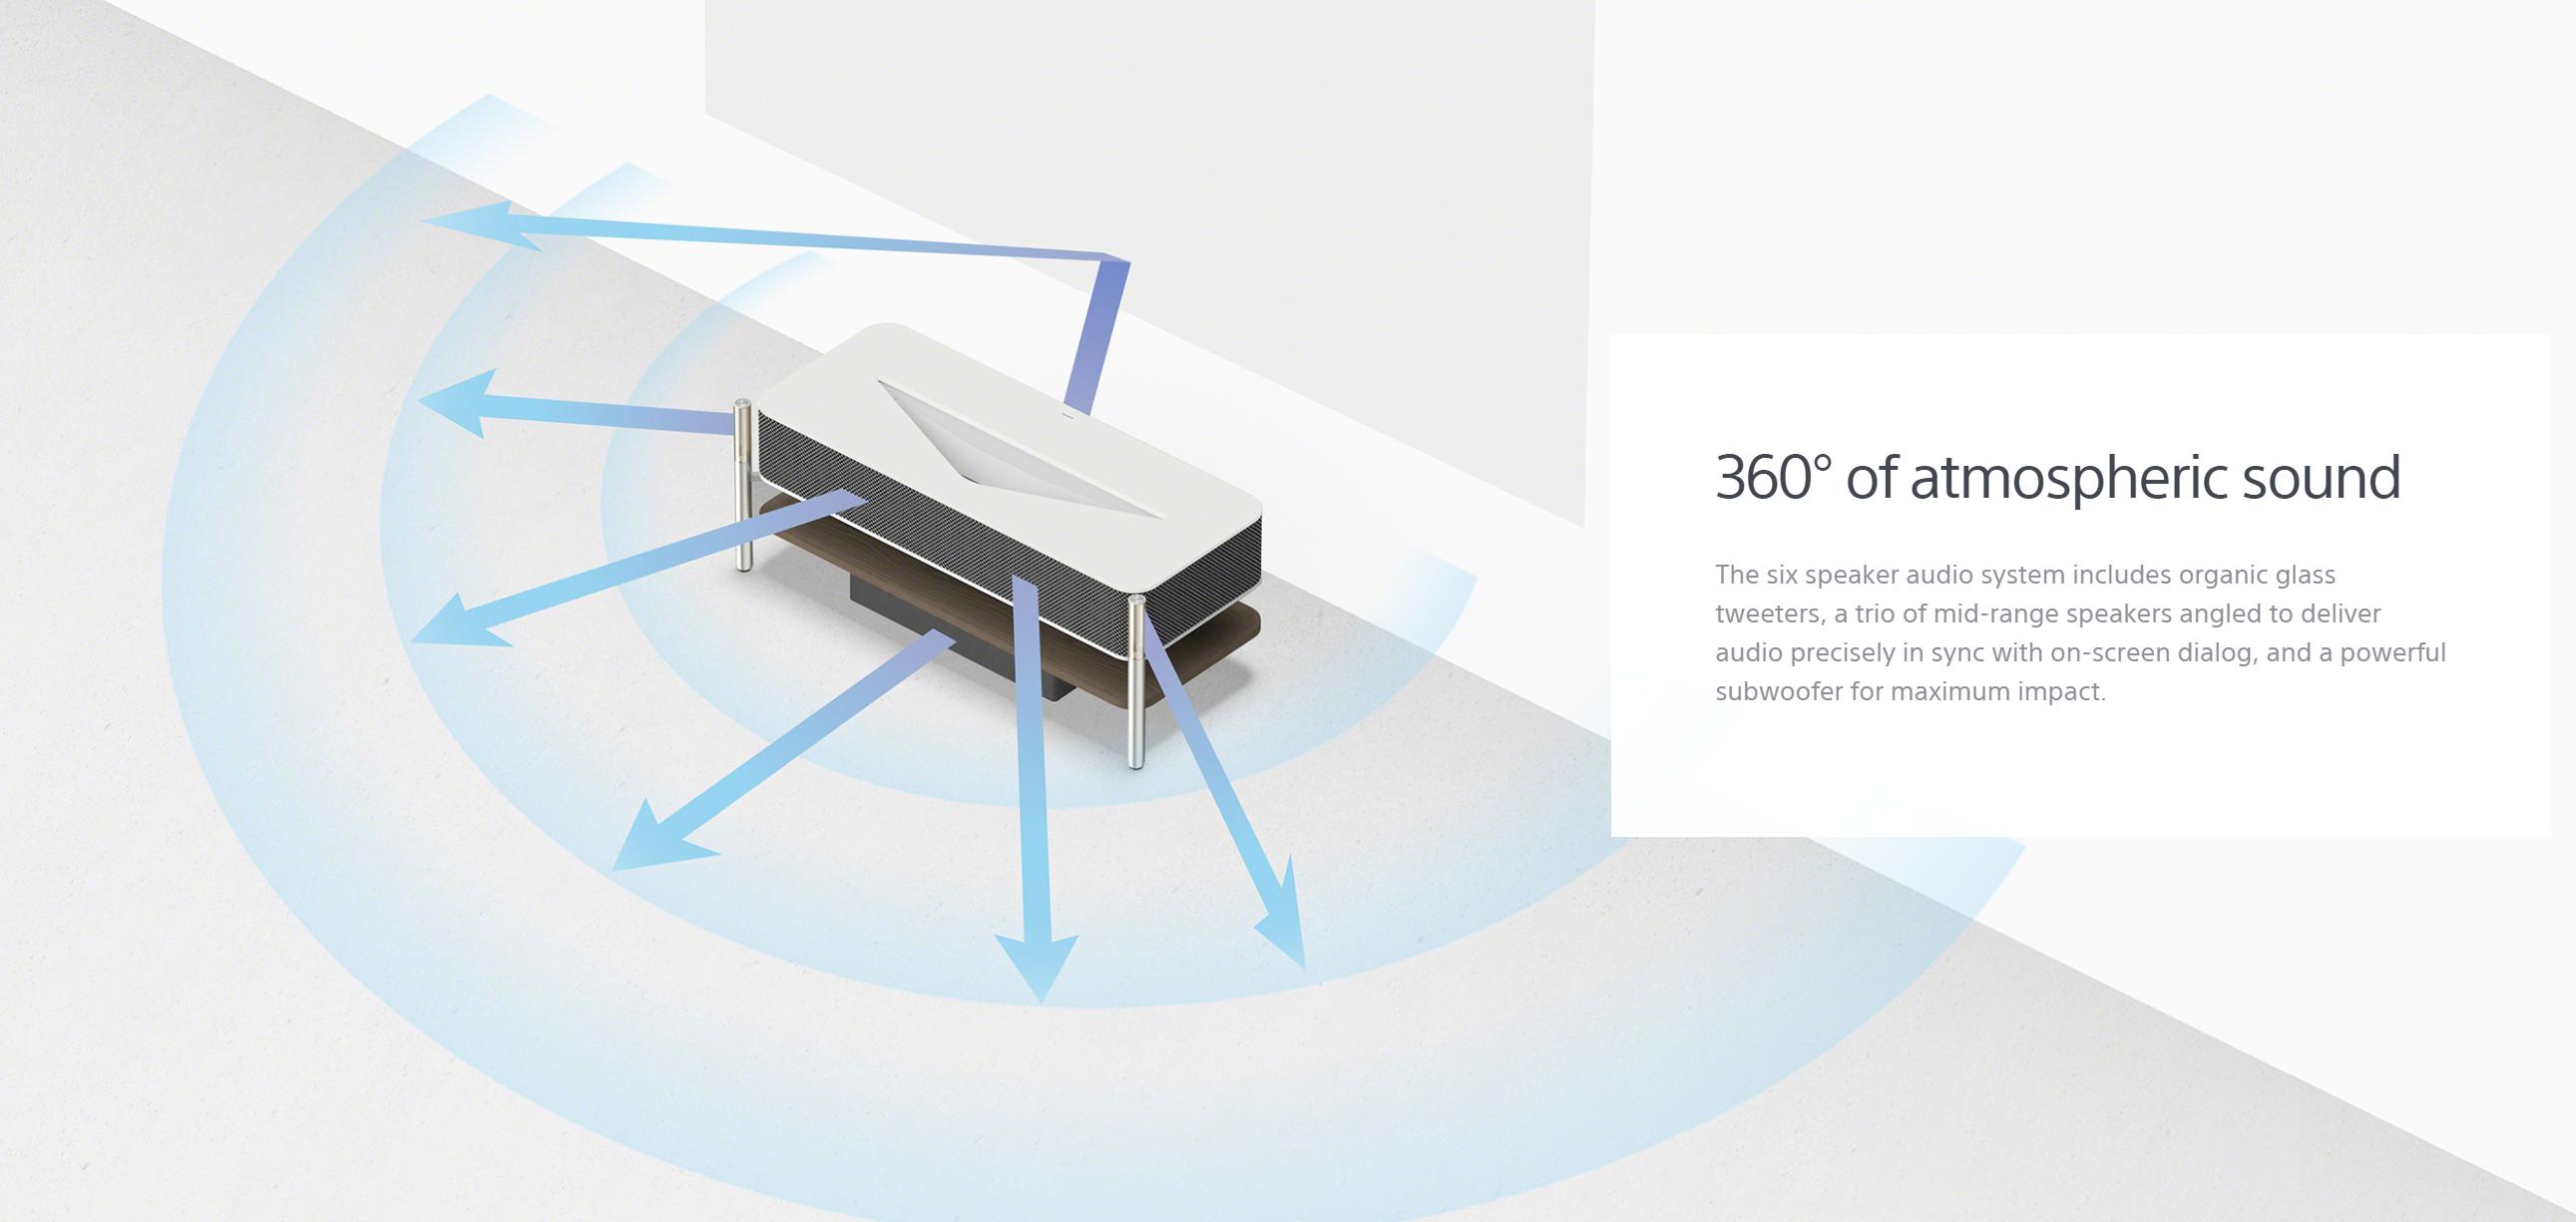 Sony LSPX-A1: 30.000-Dollar-Beamer strahlt 80 Zoll aus 0 cm Entfernung - Sony LSPX-A1 (Bild: Sony)